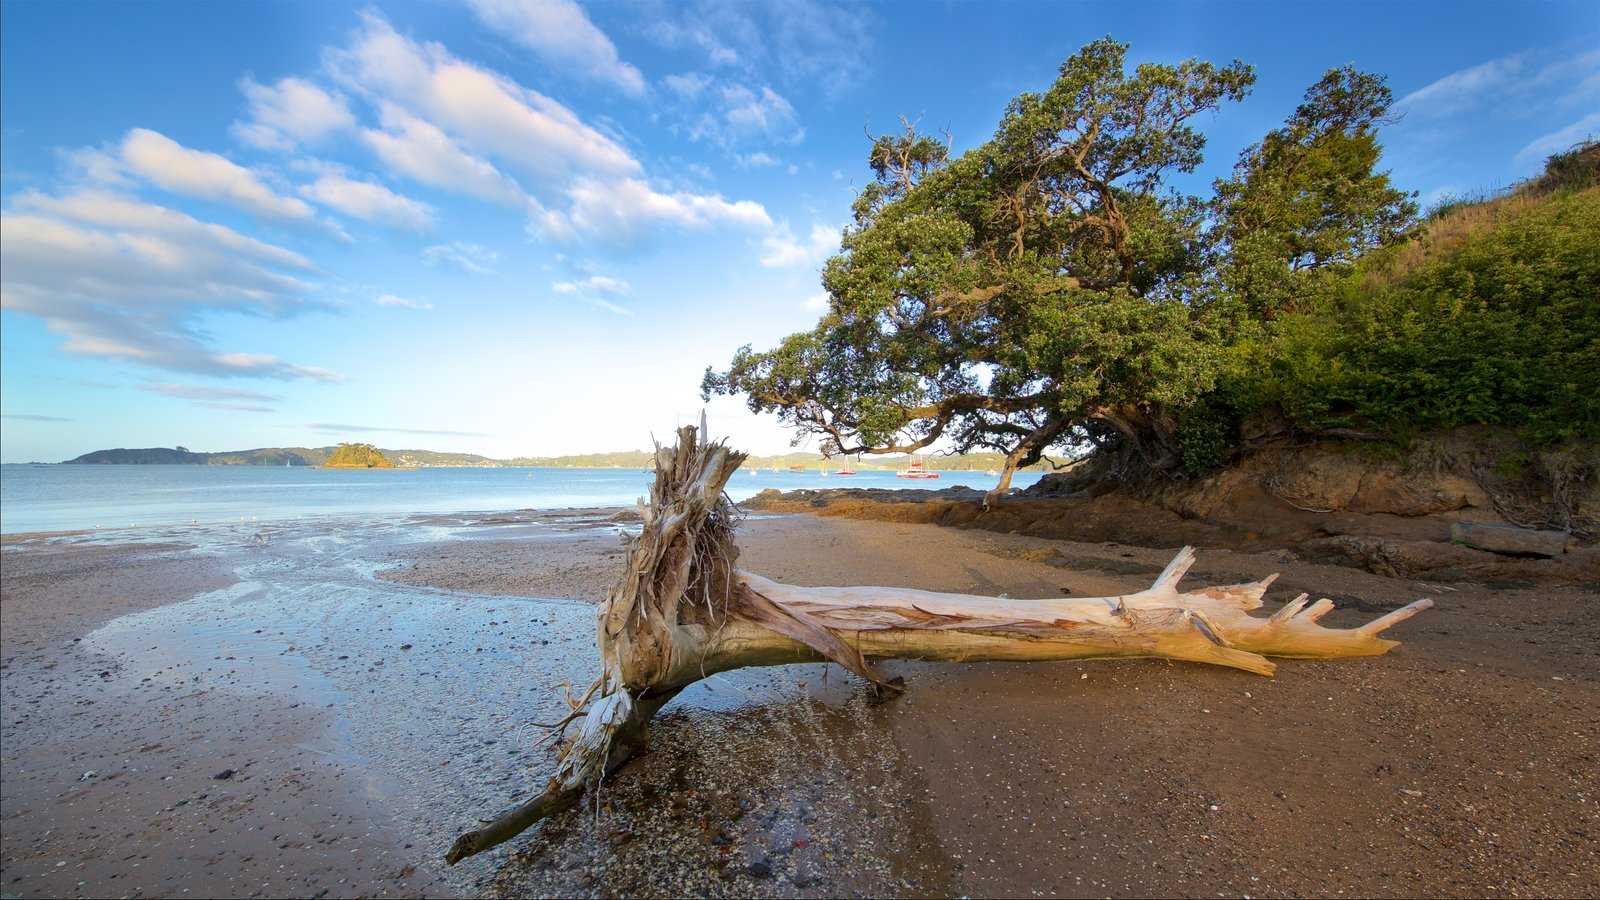 Paihia which includes a sandy beach, a bay or harbor and a pebble beach